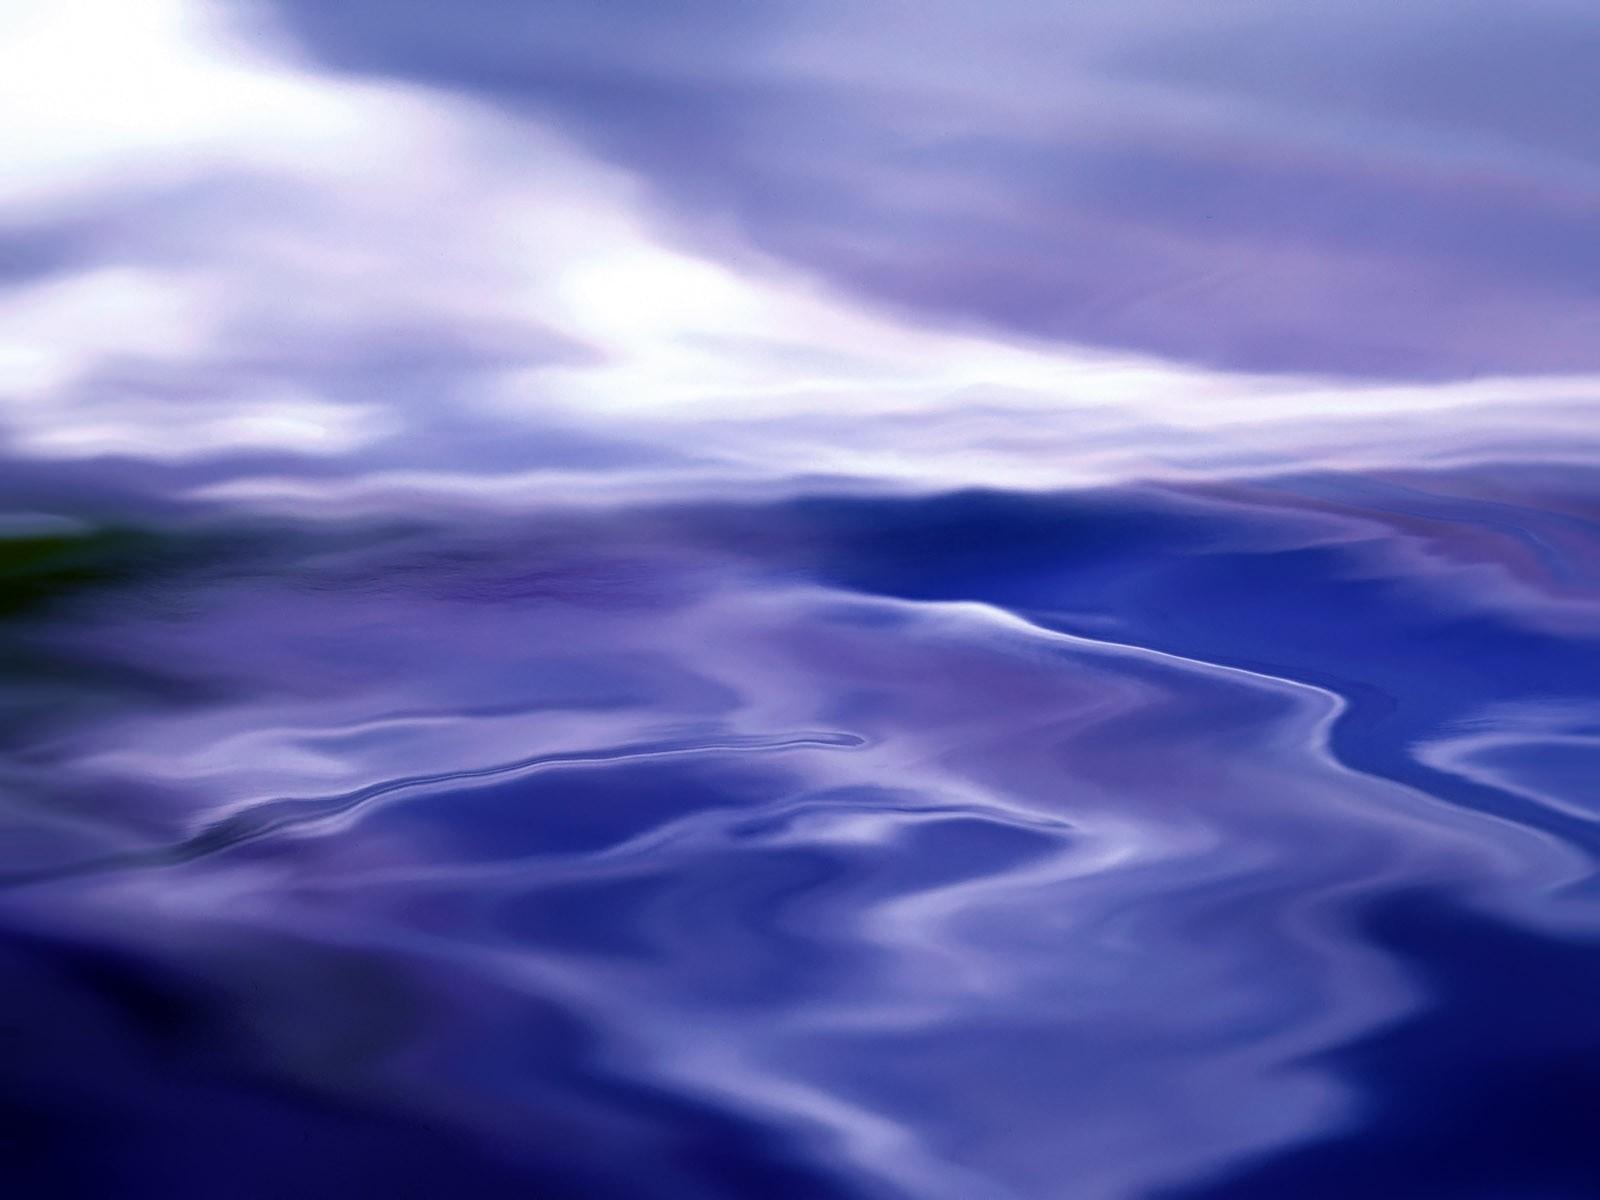 Синий ветер картинка